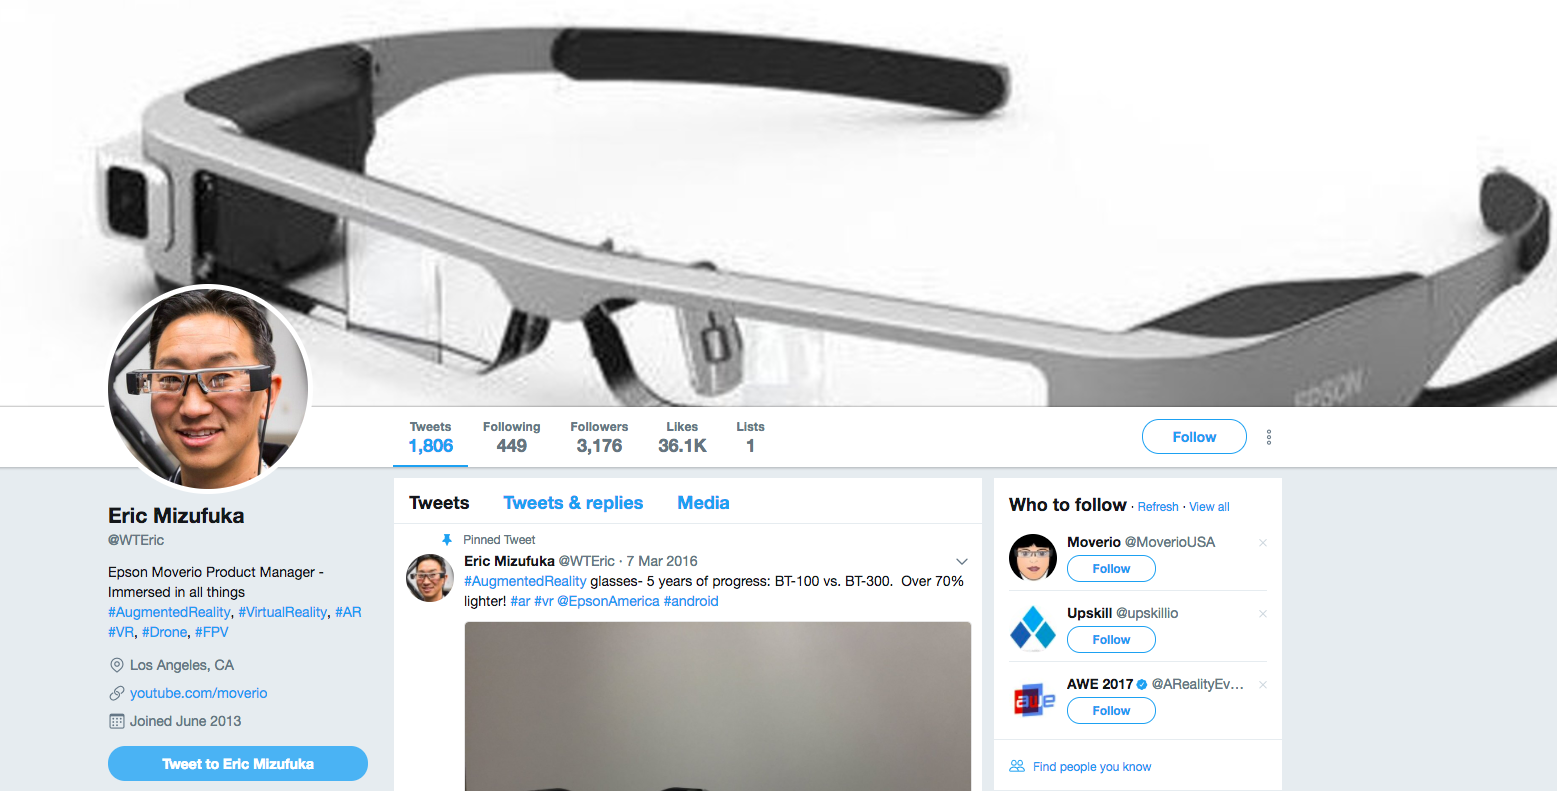 Eric Mizufuka TOp Augmented Reality Influencer